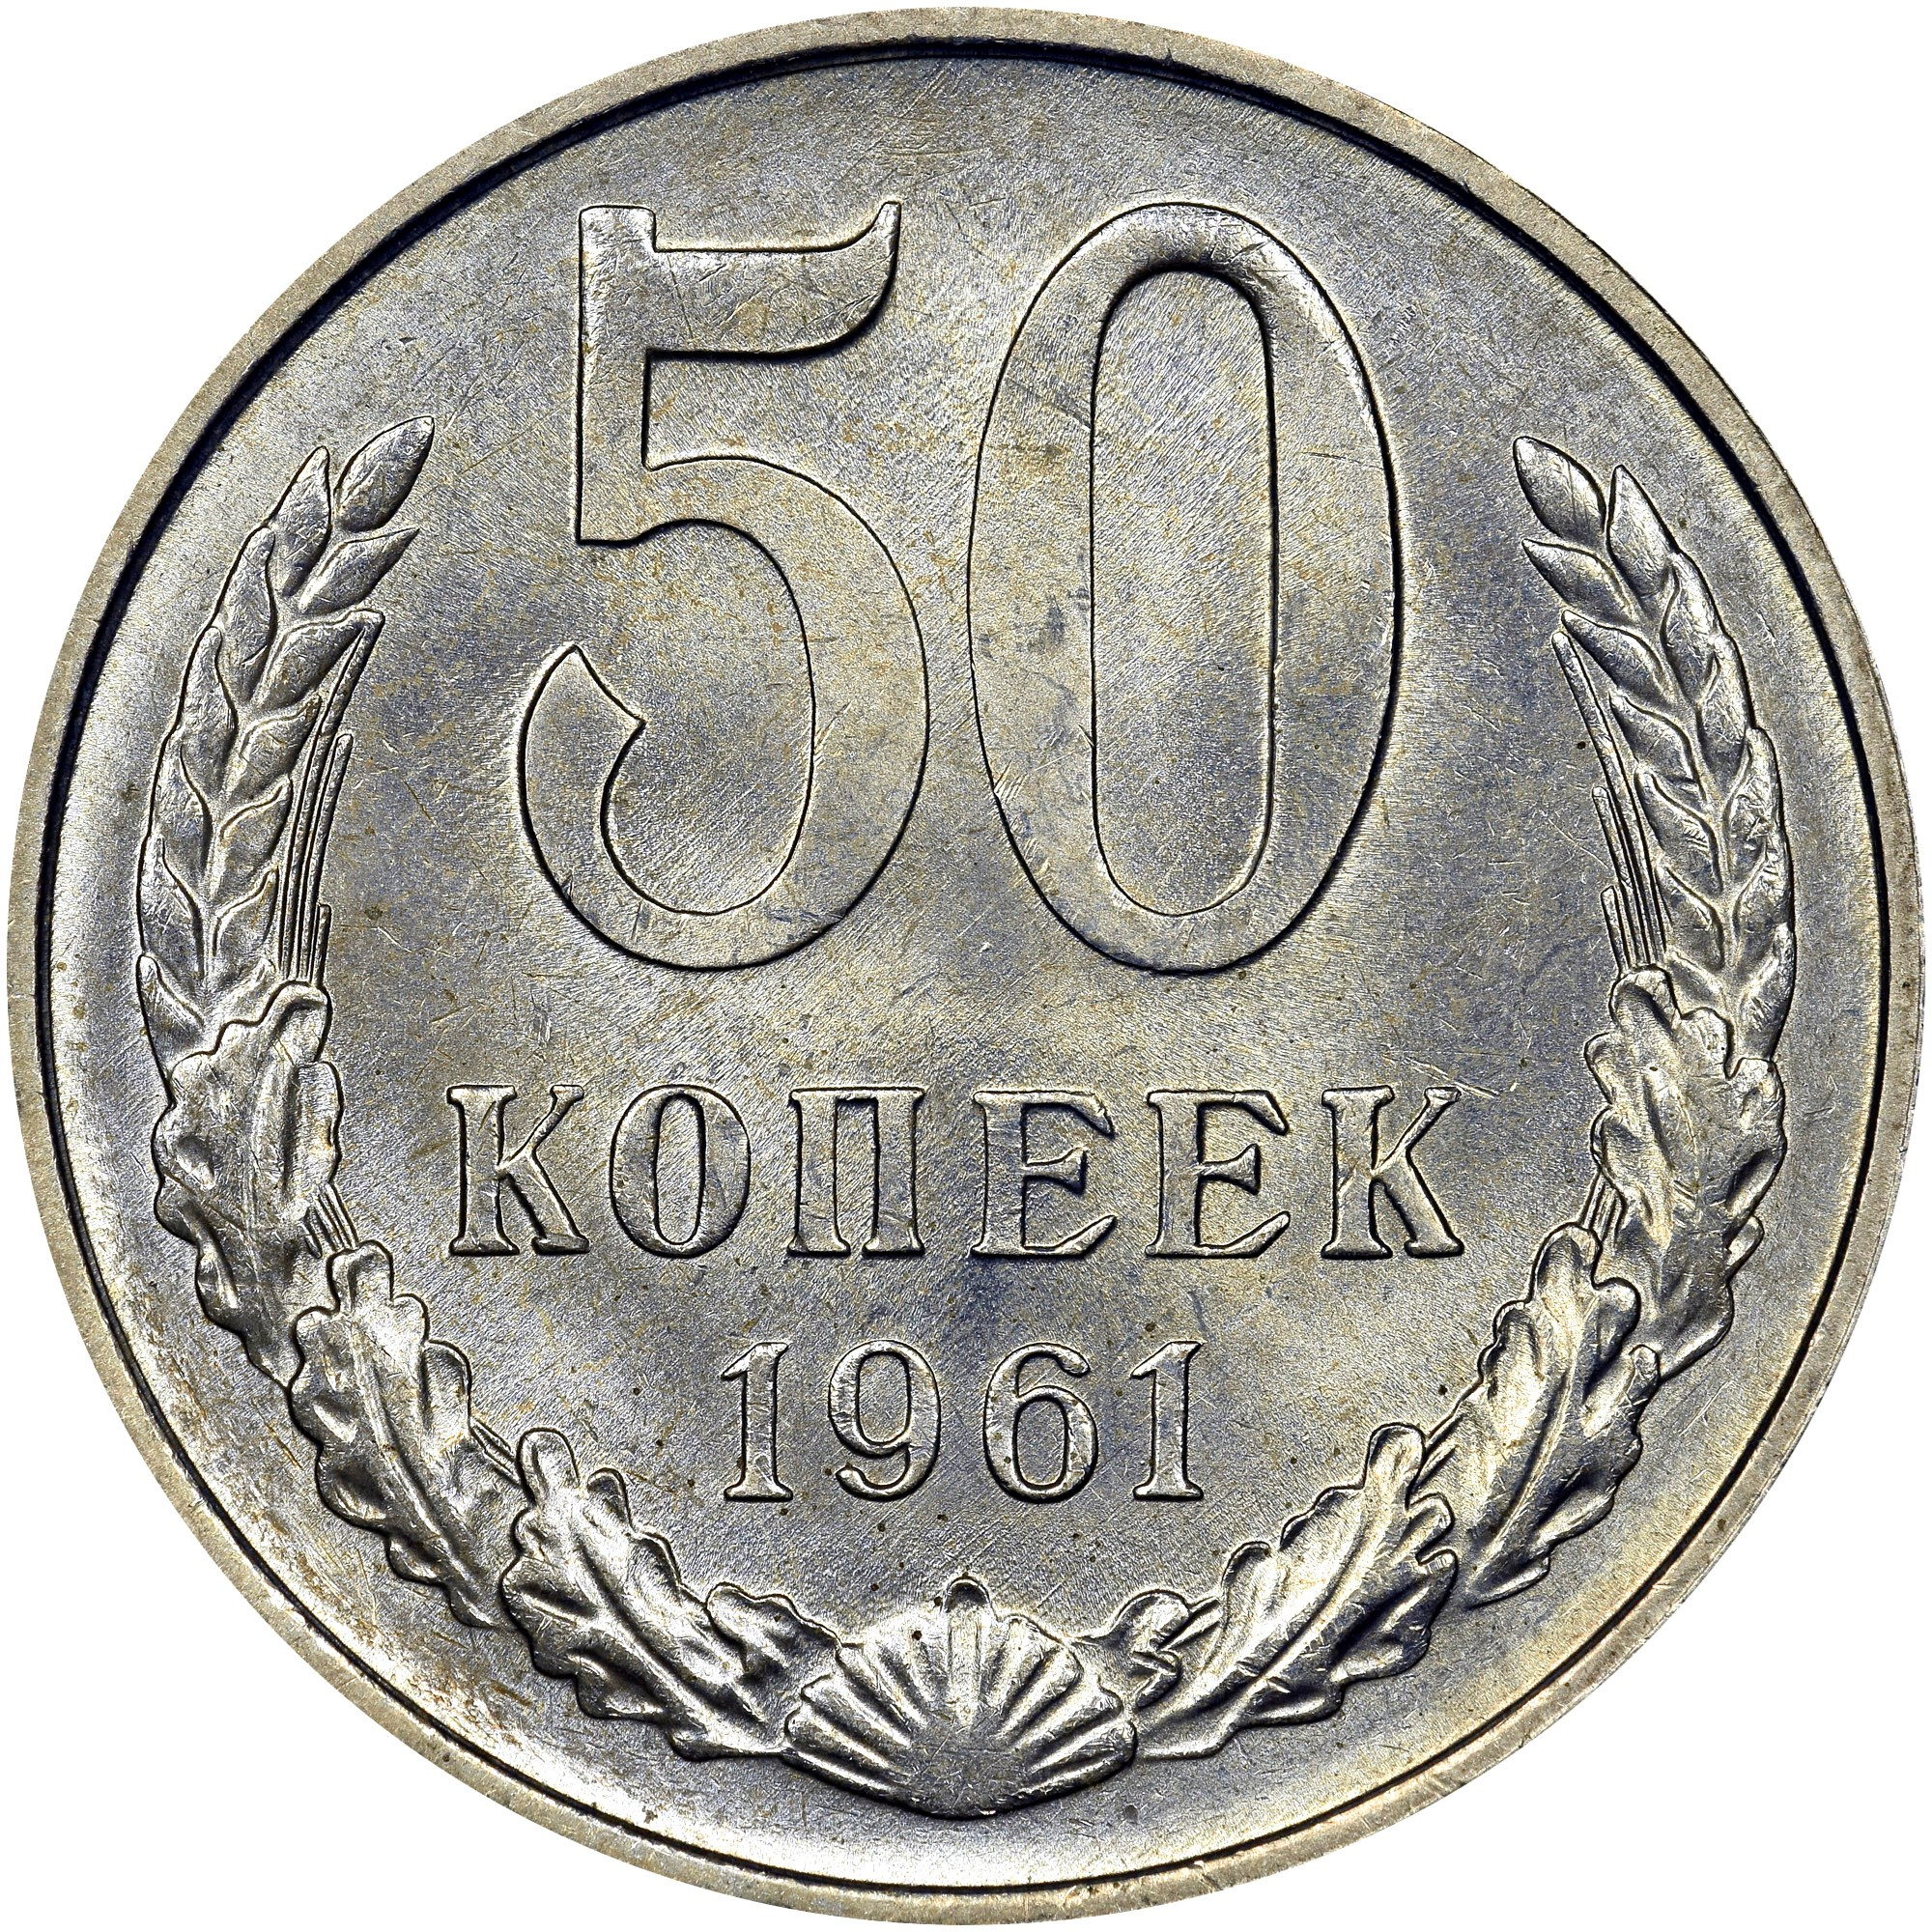 ONE POLTINNICK ***YURI GAGARIN***USSR***EXONUMIA SILVERED COIN 50 KOPECKS 1961